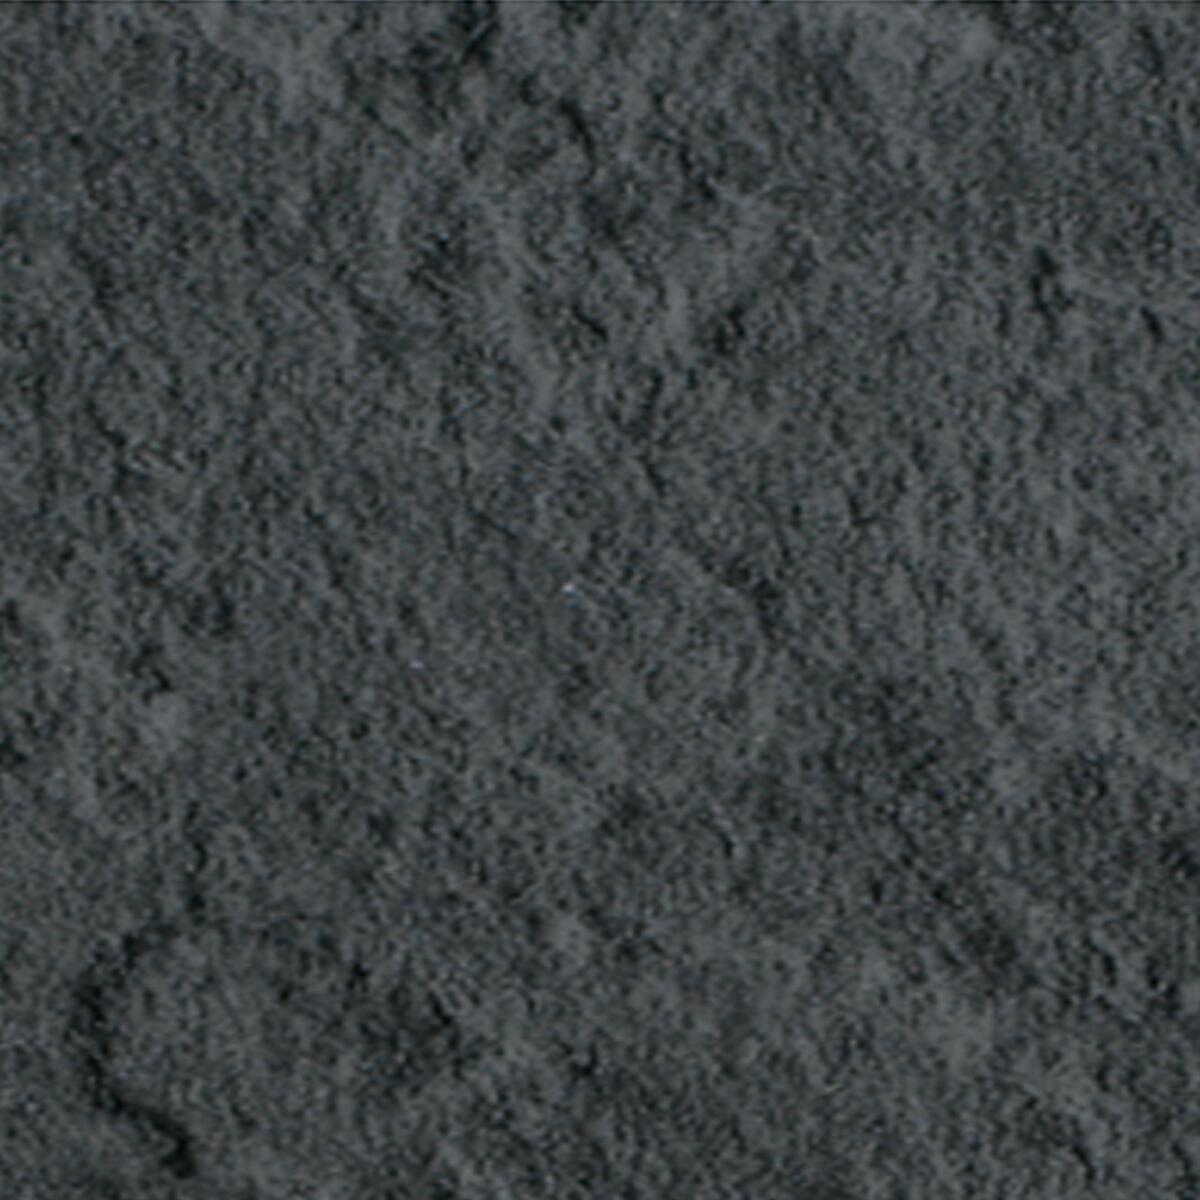 Pavimento PVC adesivo Slate Sp 1.5 mm nero - 2